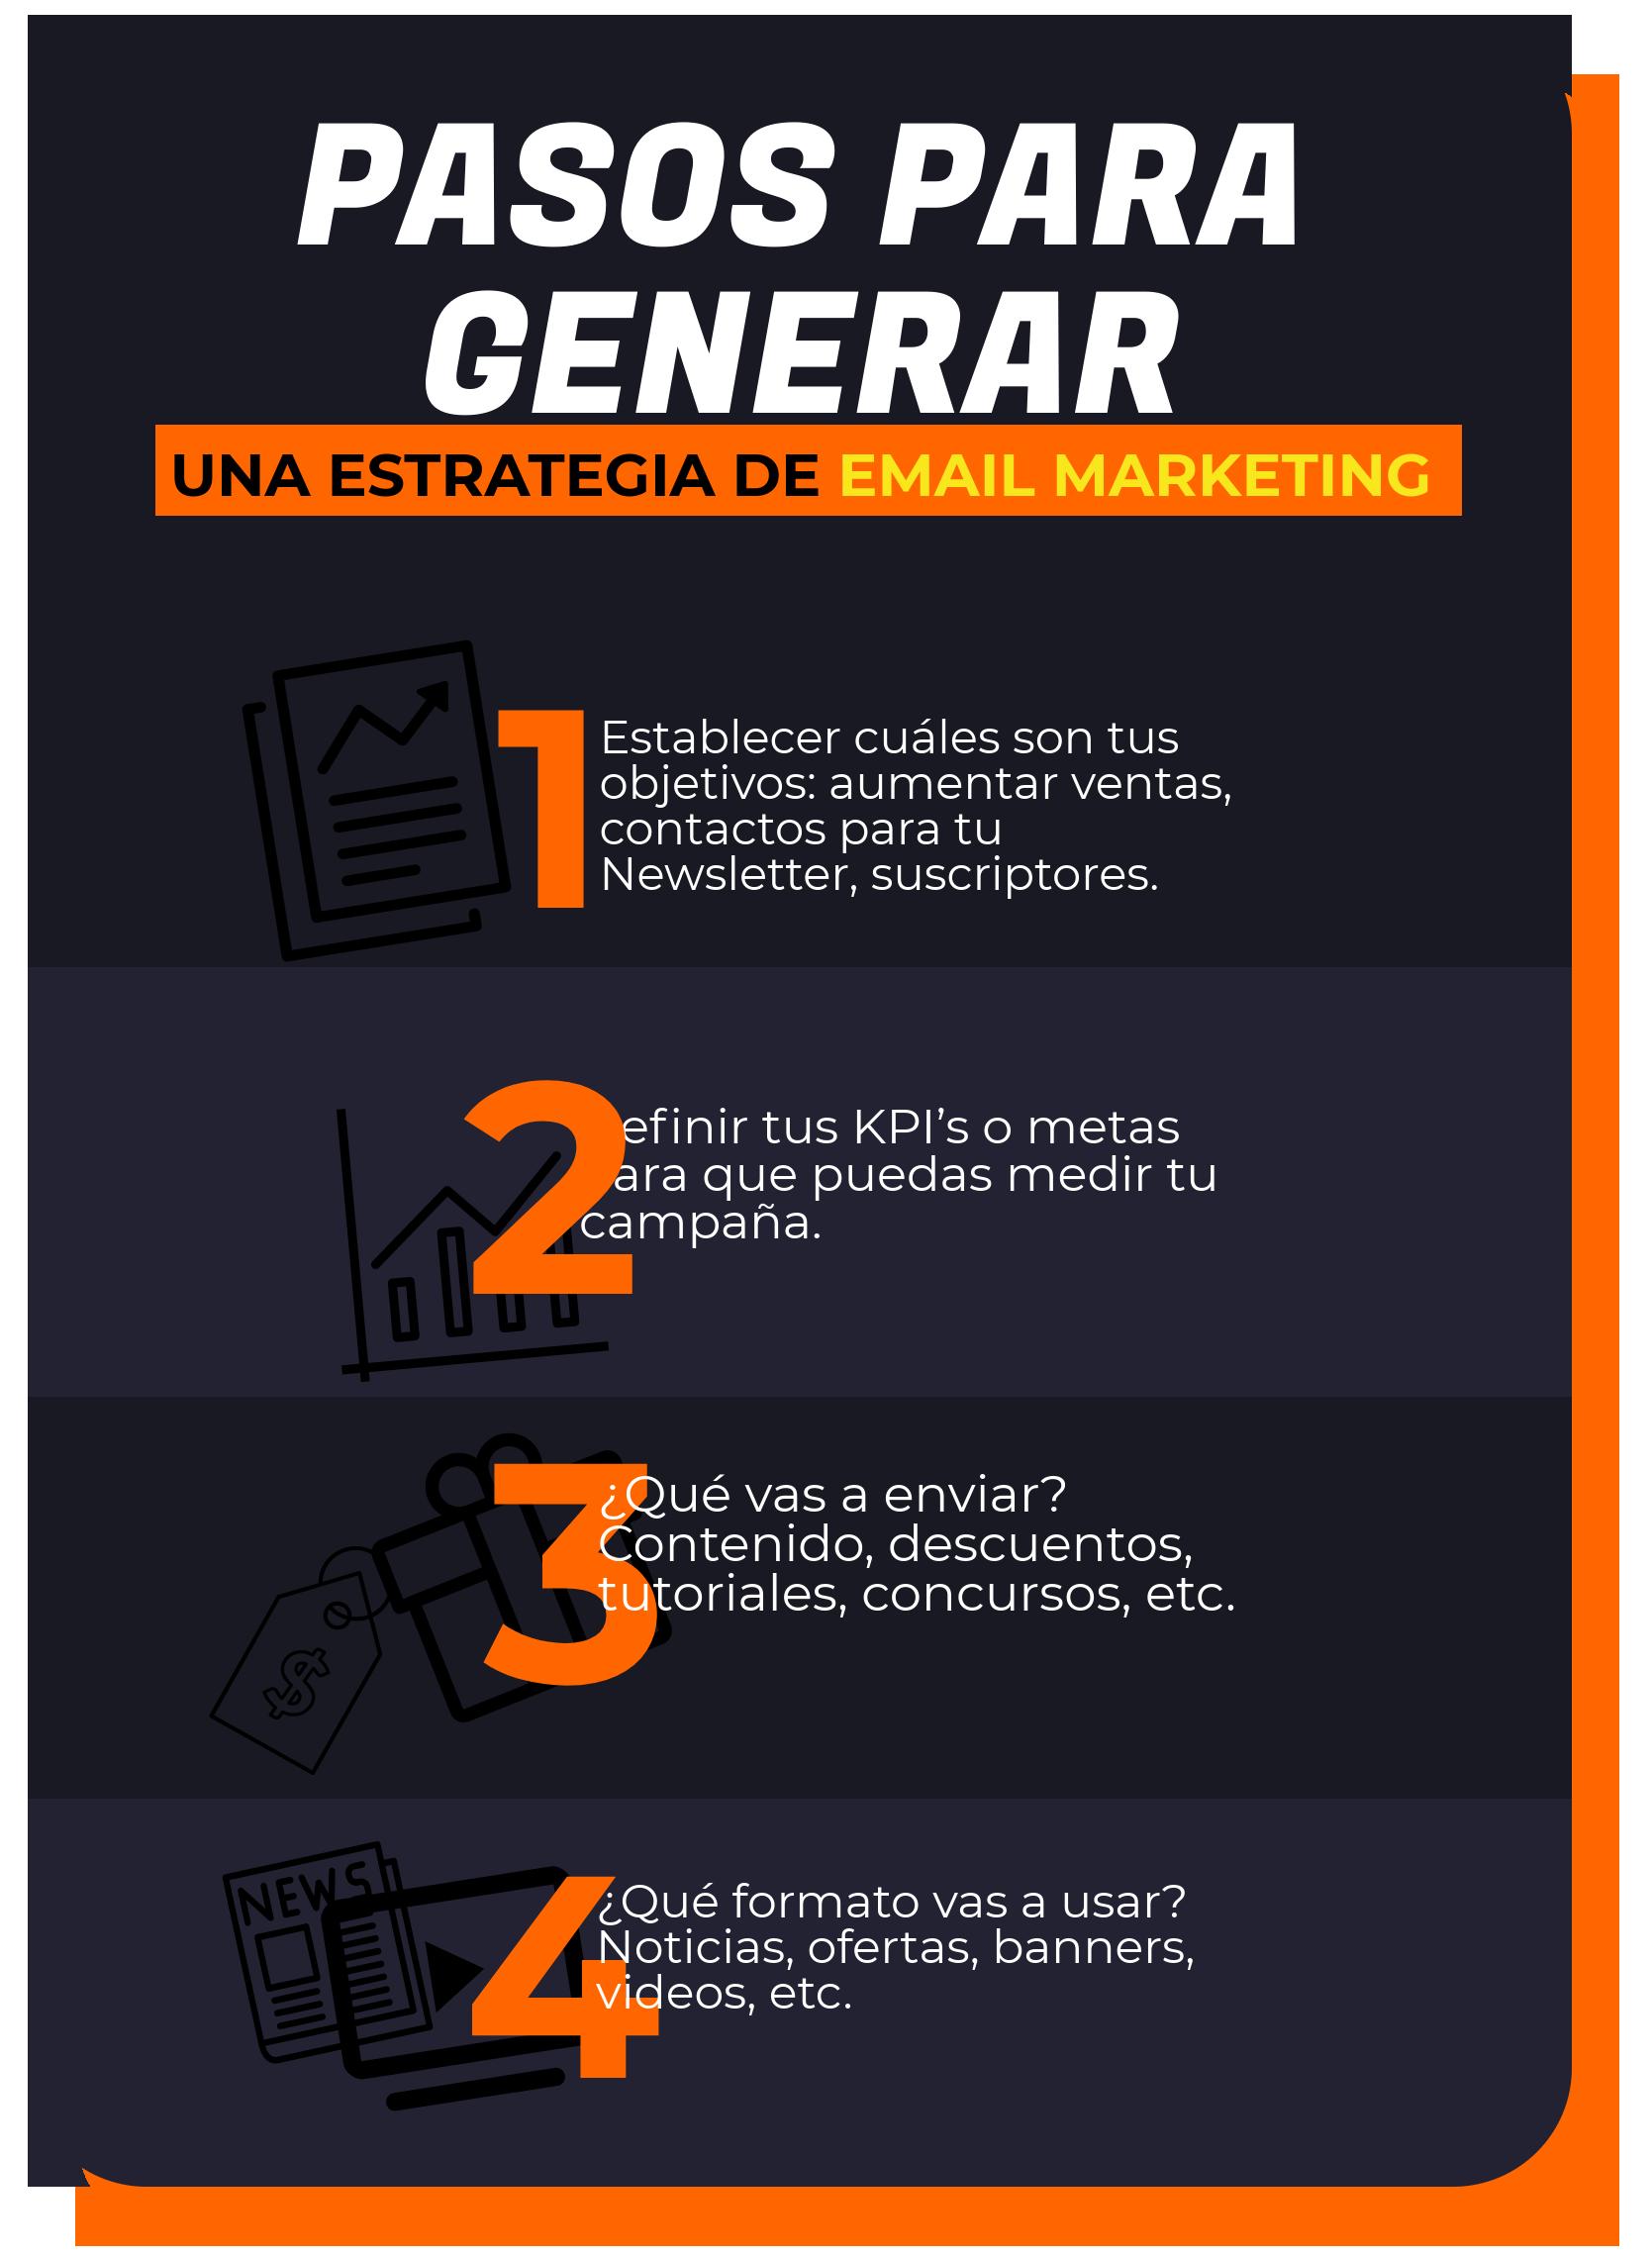 marketing-digital-pasos-para-email-marketing